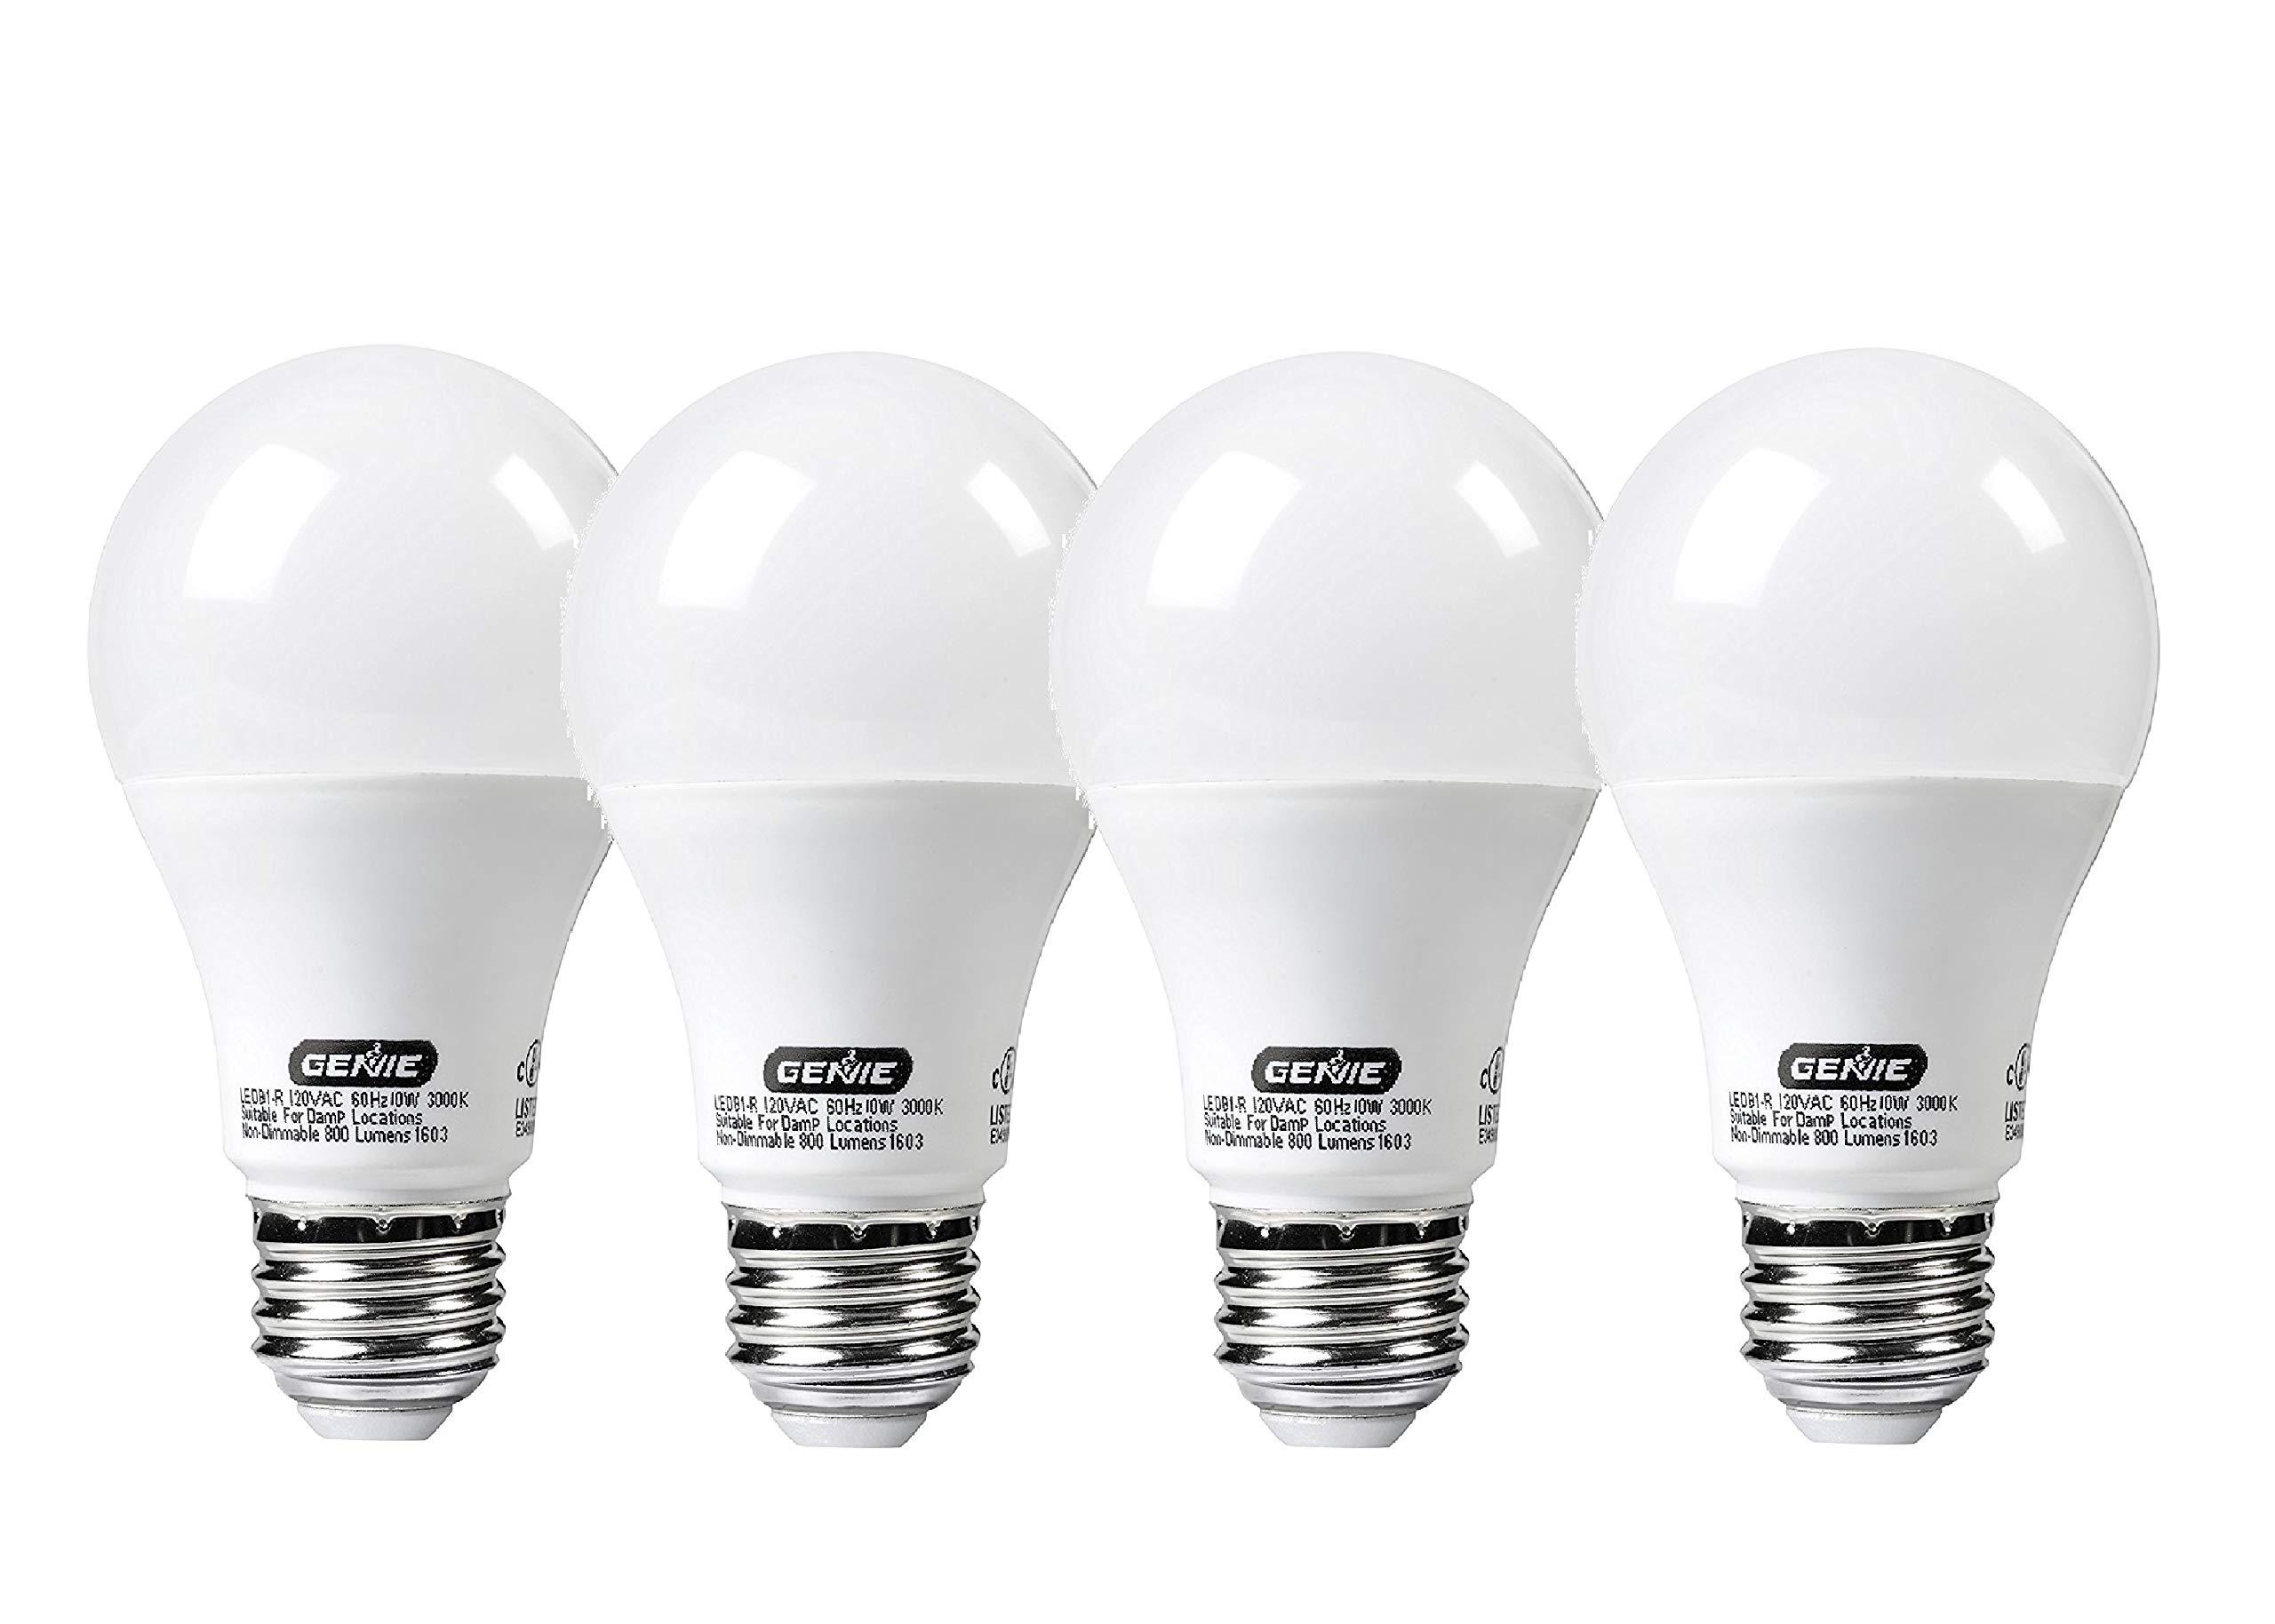 Genie LED Garage Door Opener Light Bulb - 60 Watt (800 Lumens) - Made to Minimize Interference with Garage Door Openers (Compatible with All Major Garage Door Opener Brands) - LEDB1-R (4 Pack) by Genie